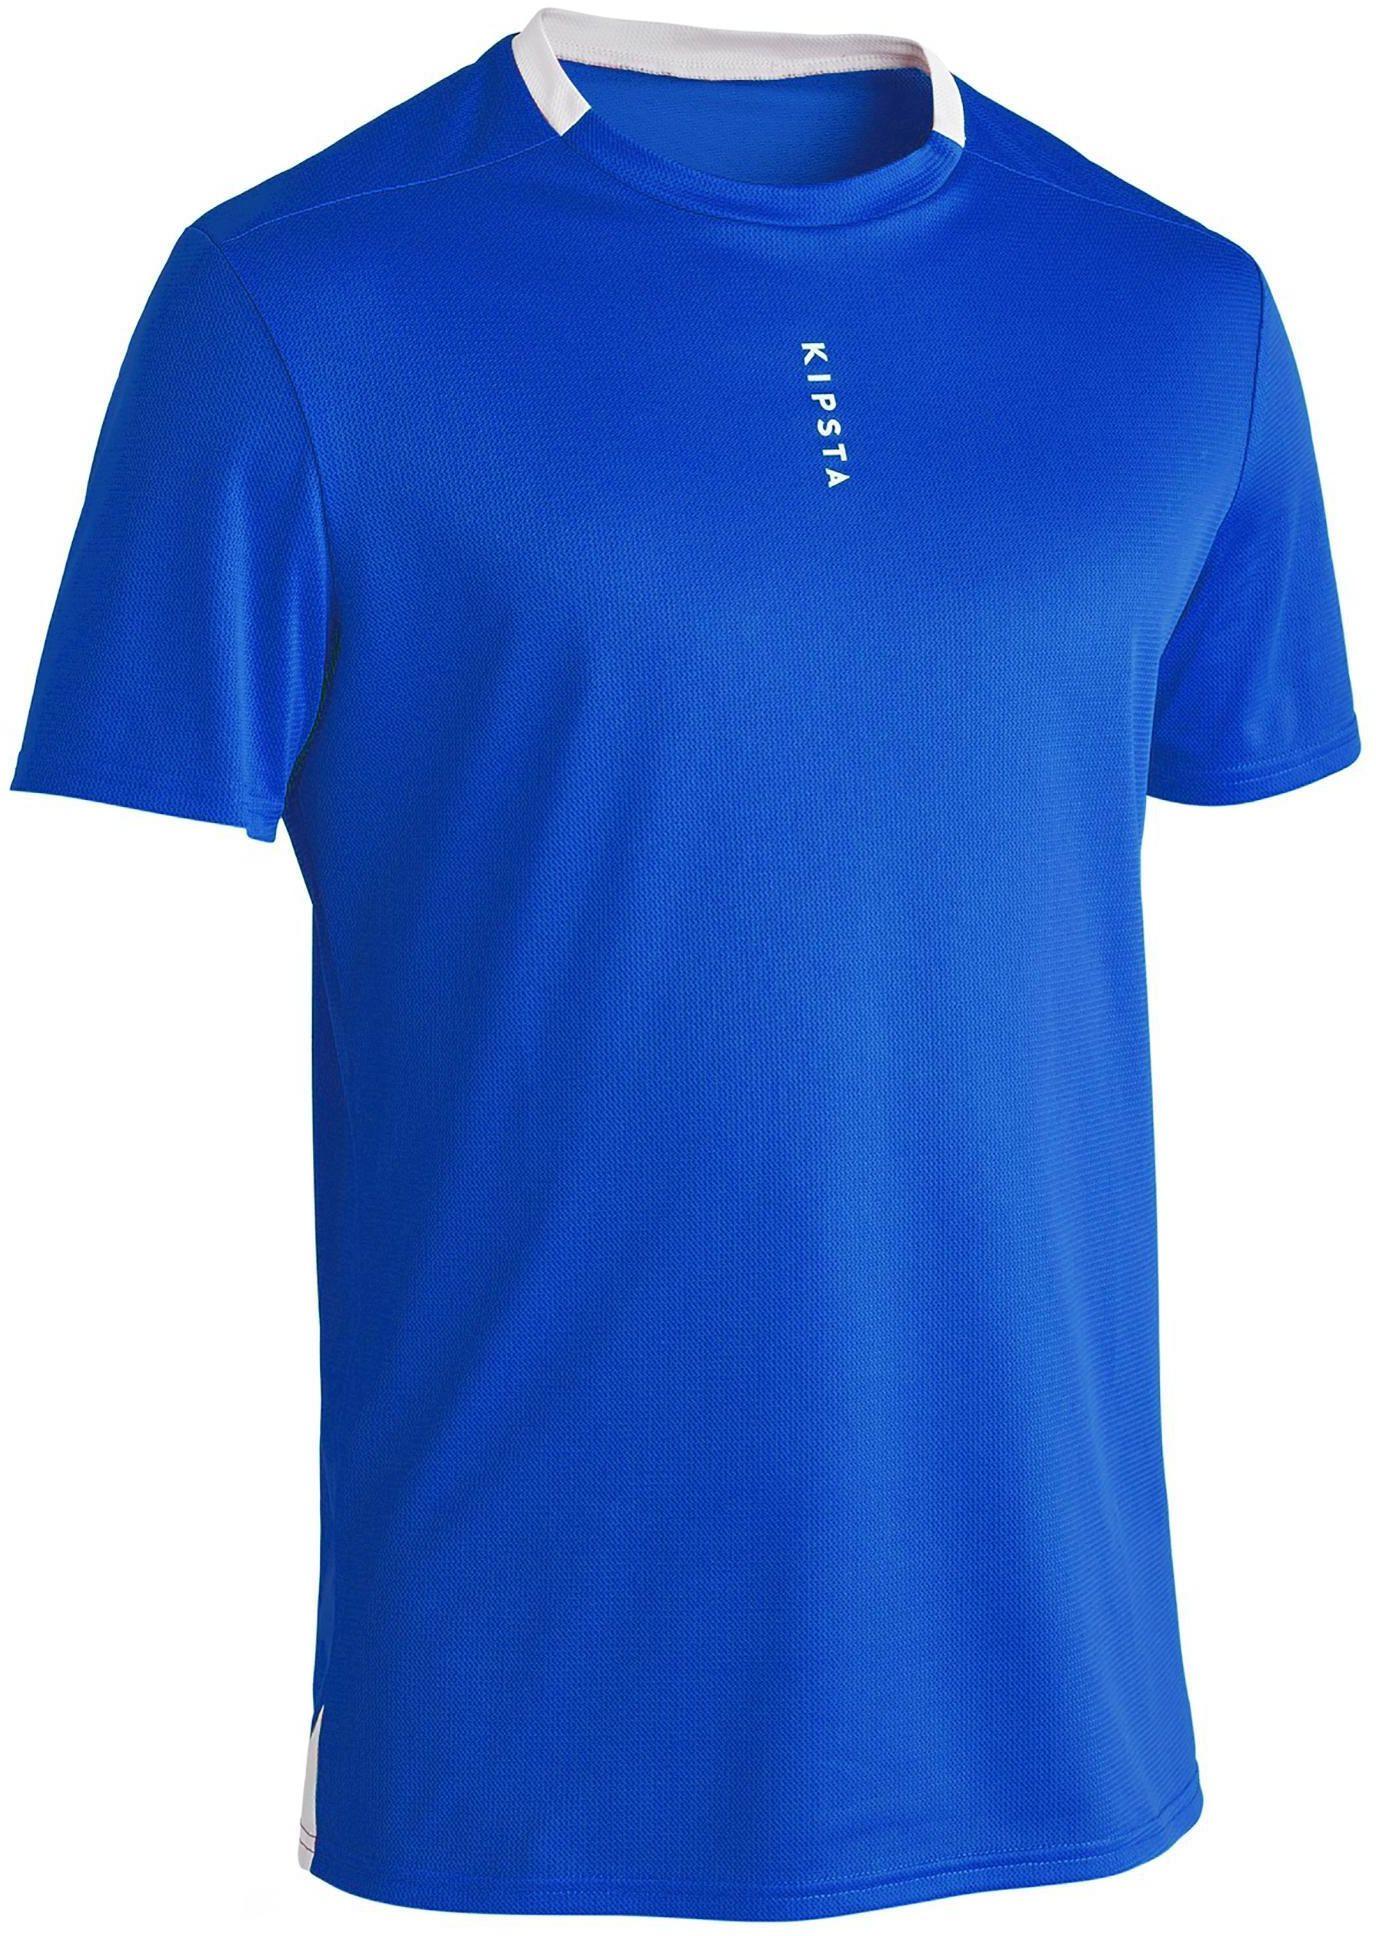 Koszulka piłkarska dla dorosłych Kipsta F100 eko